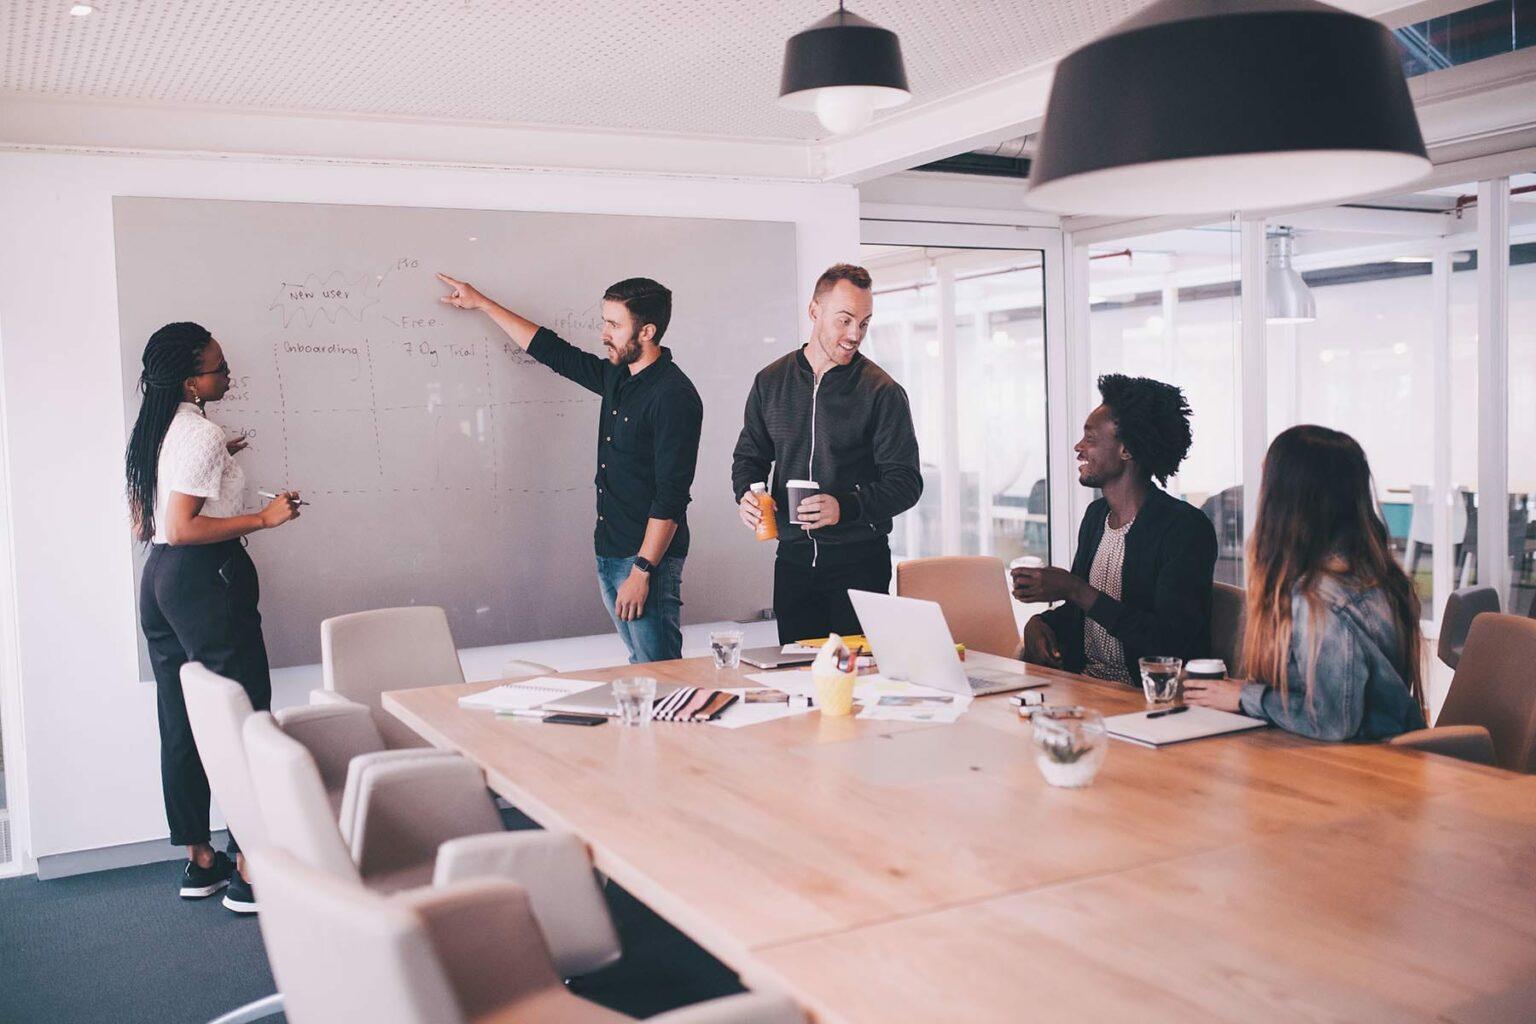 start-up-office-meeting-board-room_t20_e8kybb-web